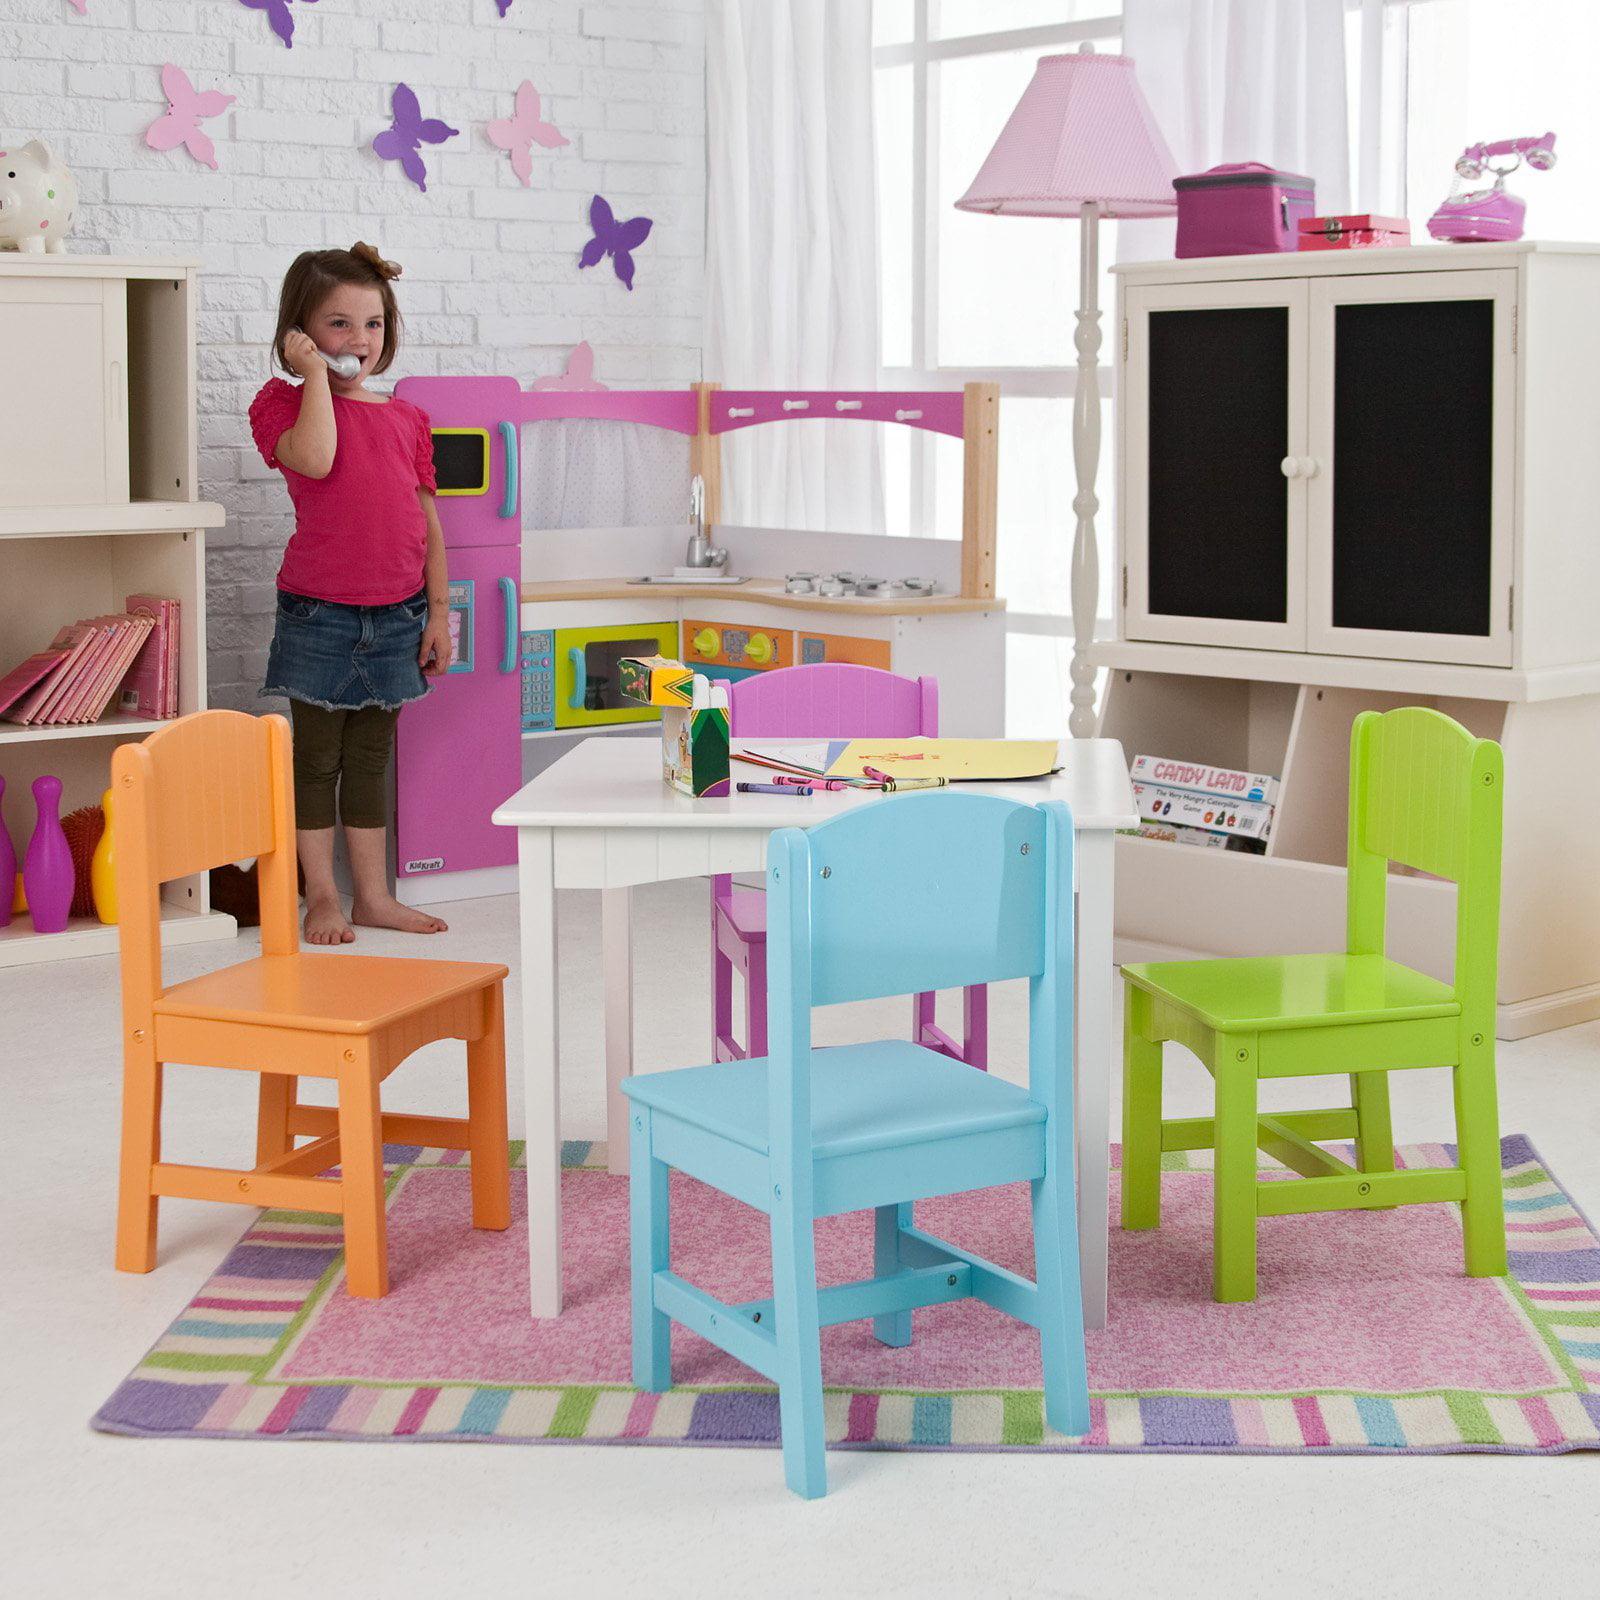 KidKraft Nantucket Big N Bright Table and Chair Set